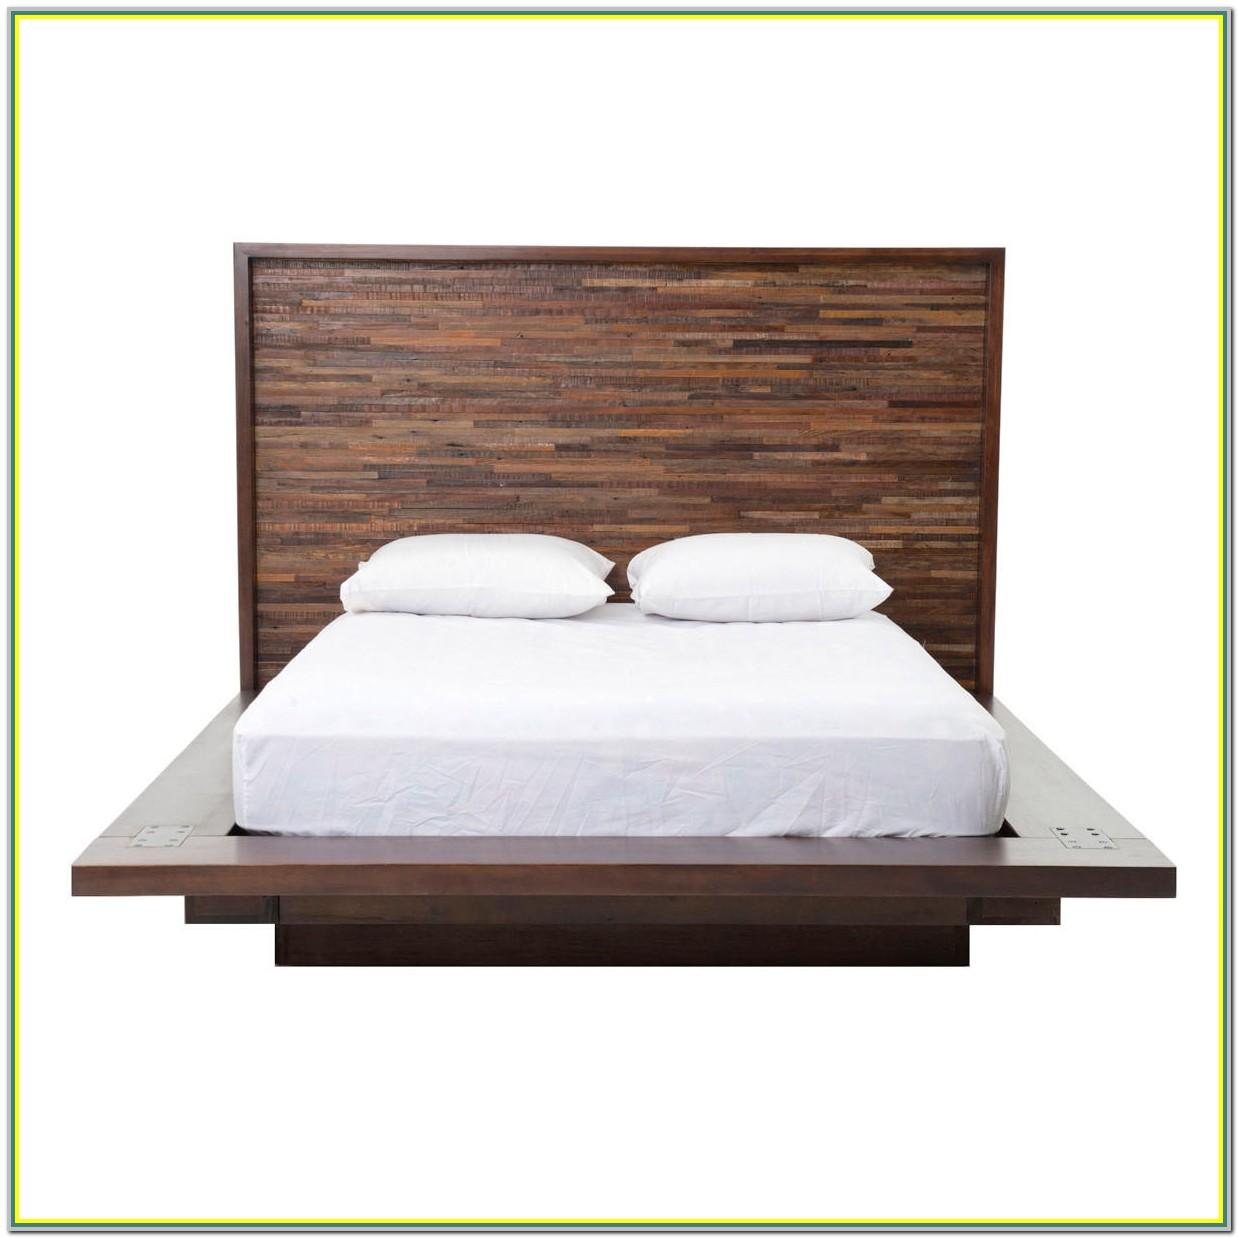 Reclaimed Wood Platform Bed Full